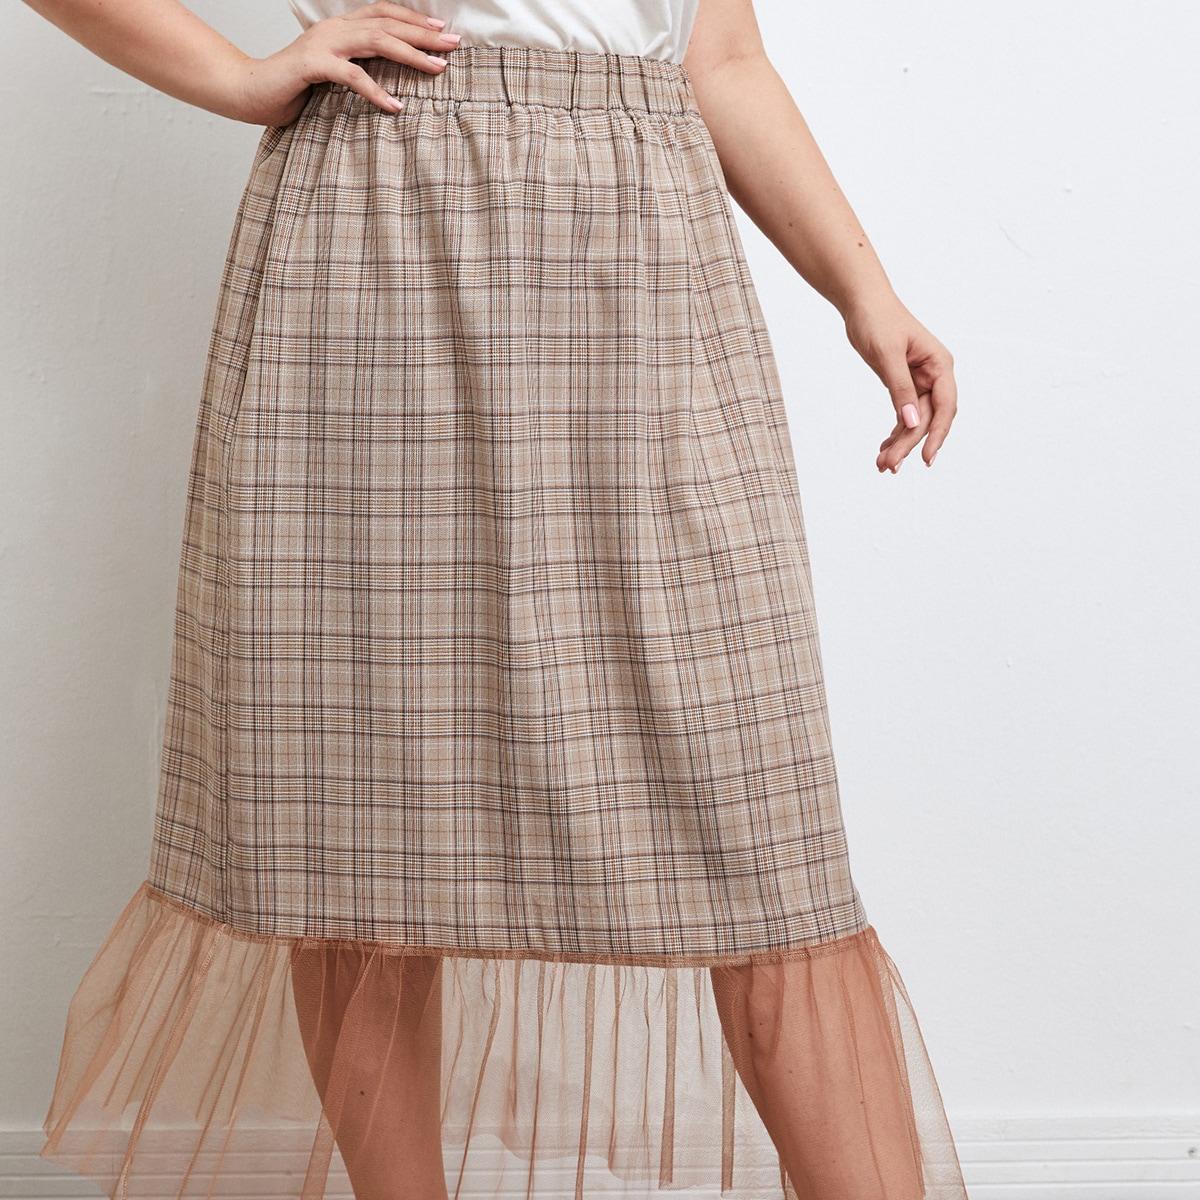 SHEIN / Plus Plaid Print Elastic Waist Contrast Mesh Skirt